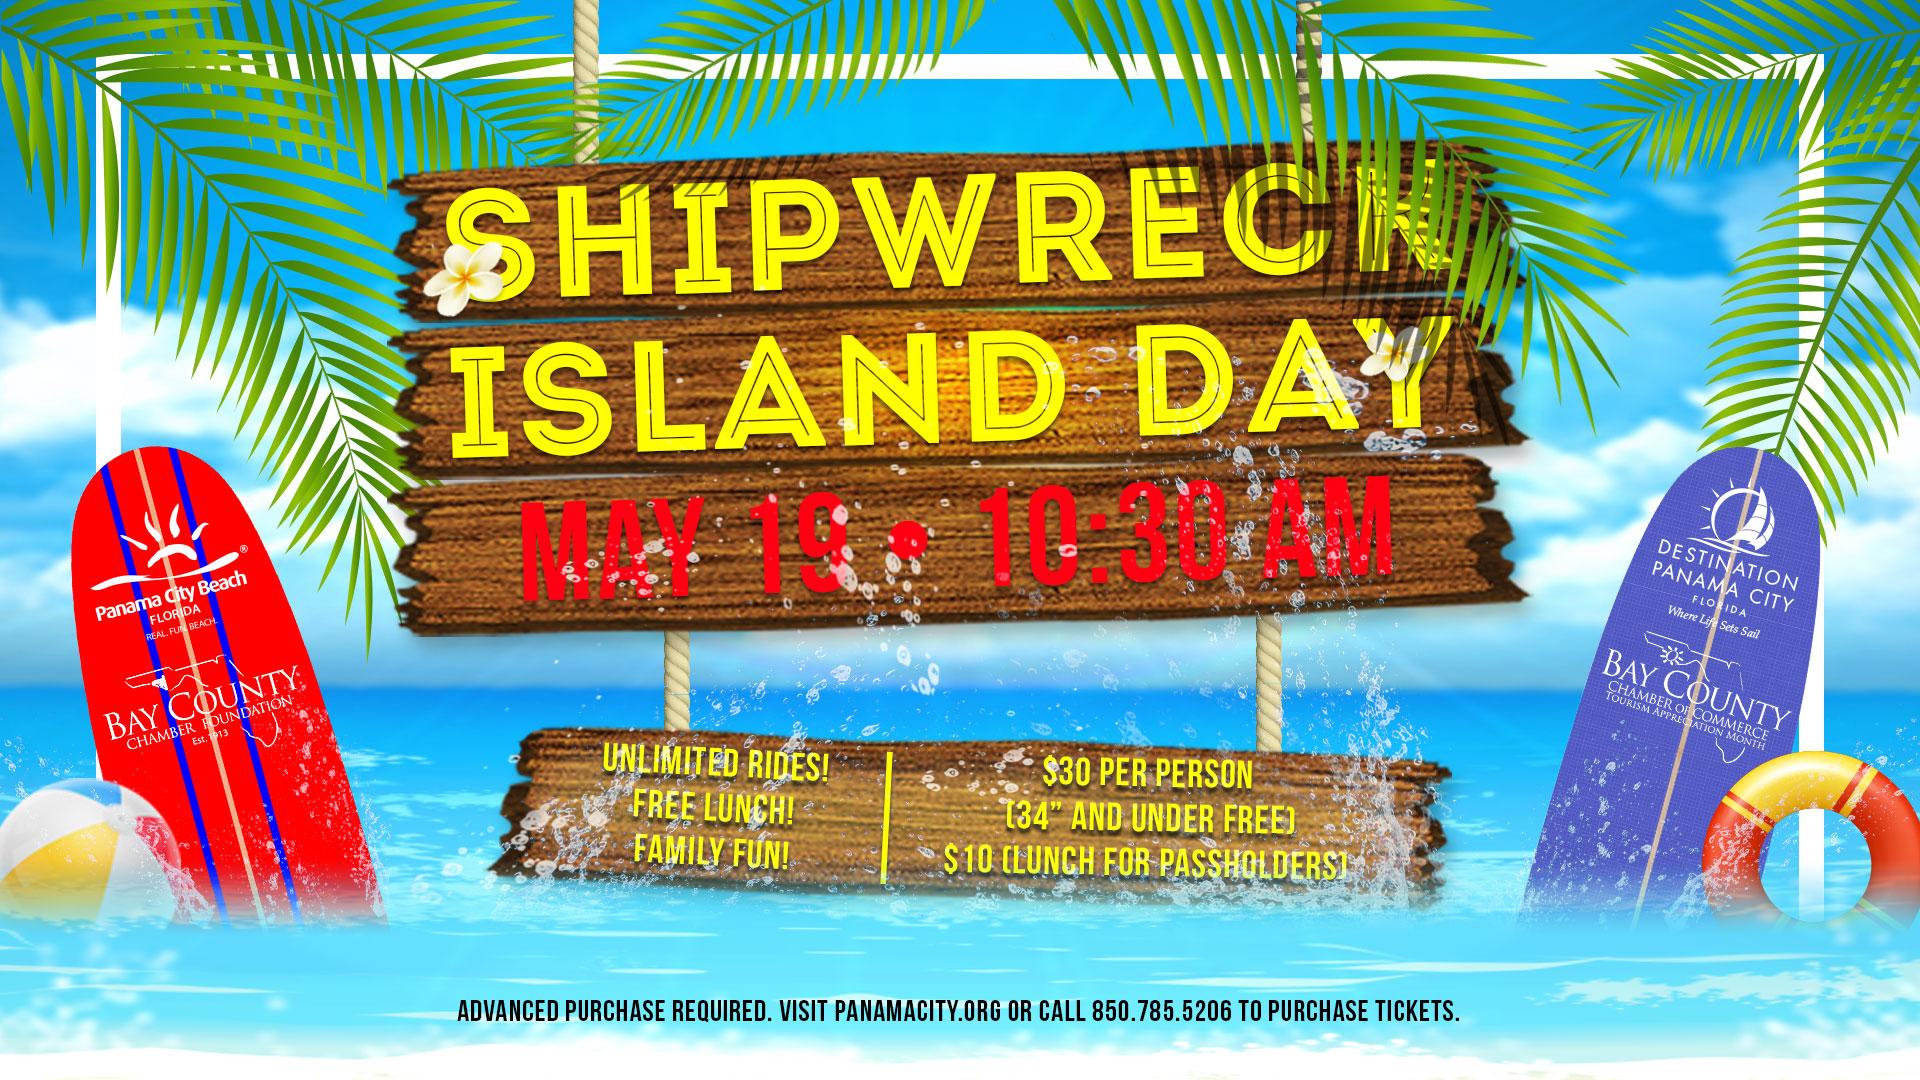 Shipwreck Island Day